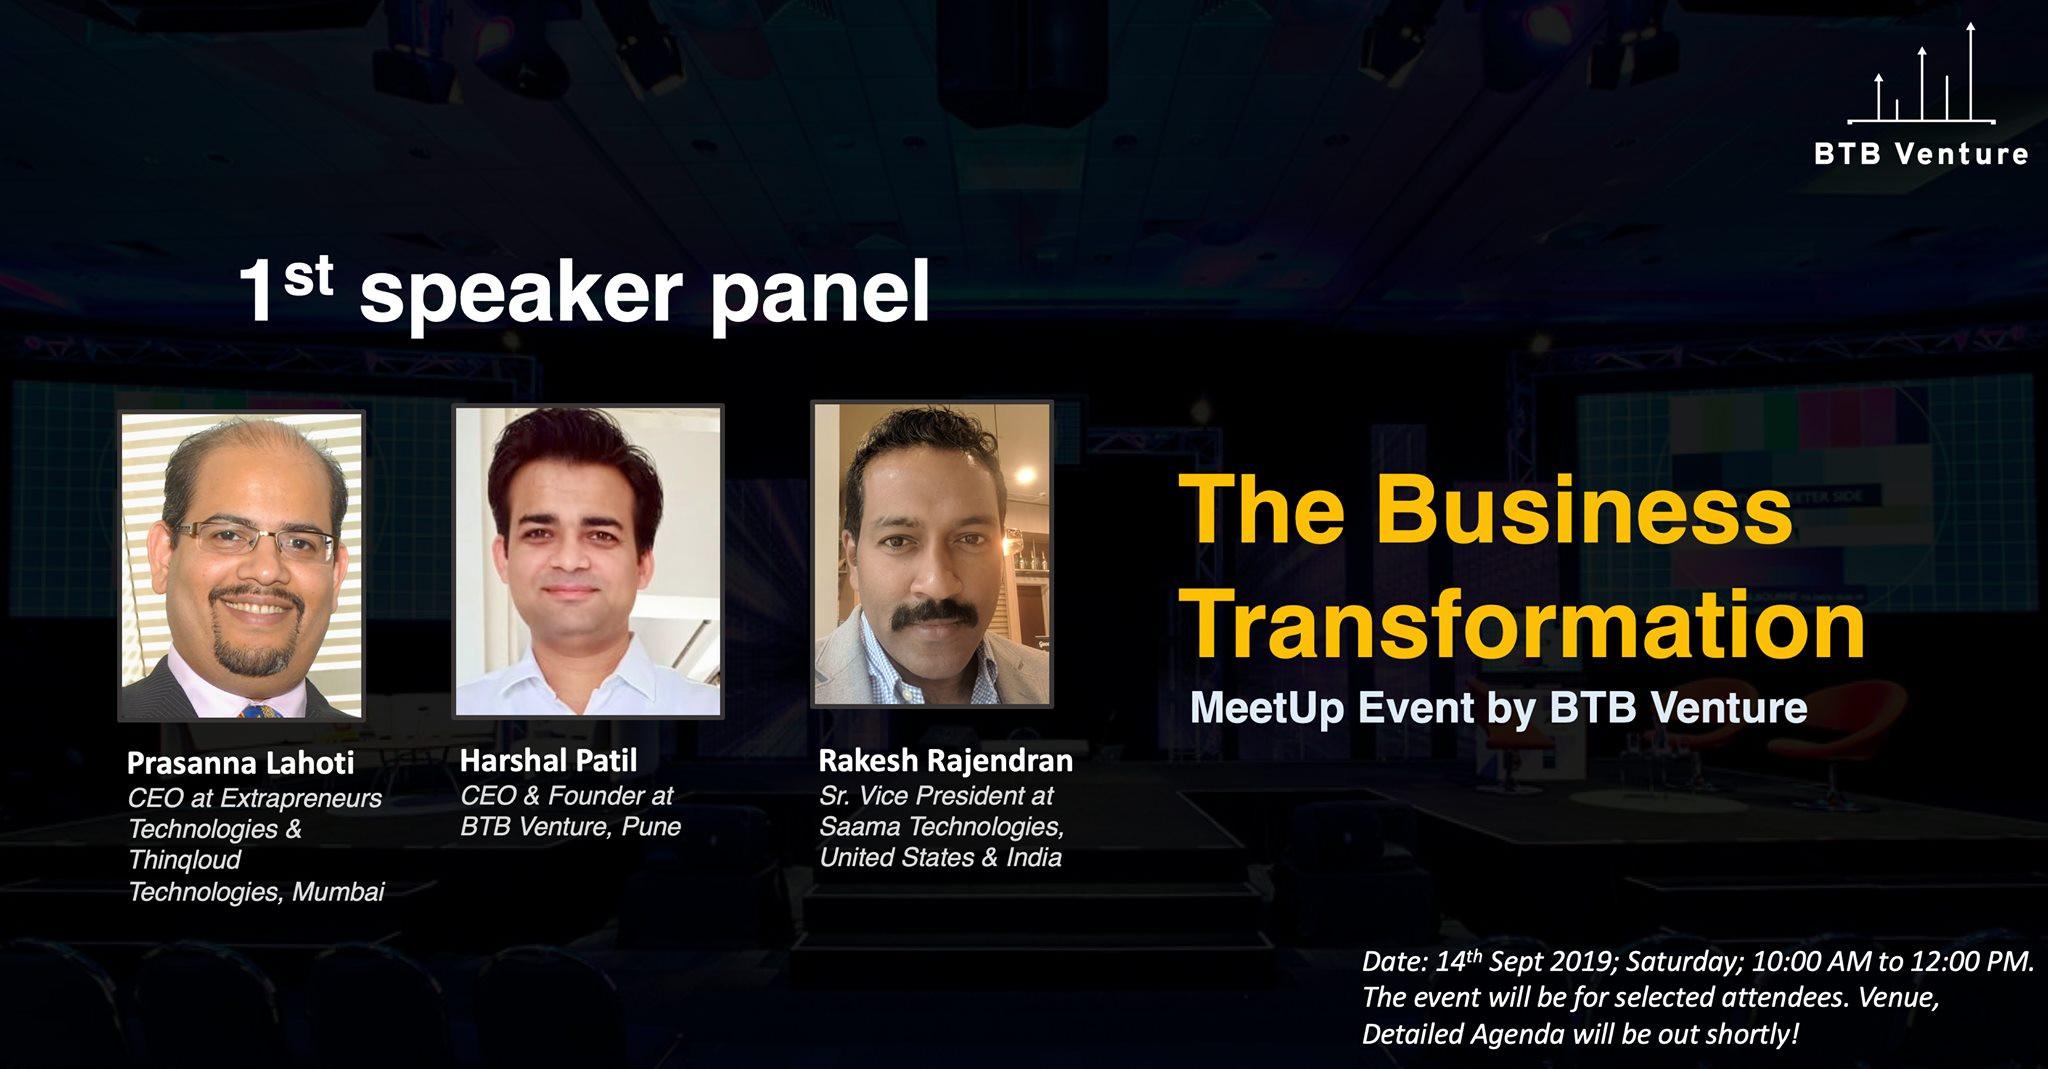 Meetup Event at BTB Venture